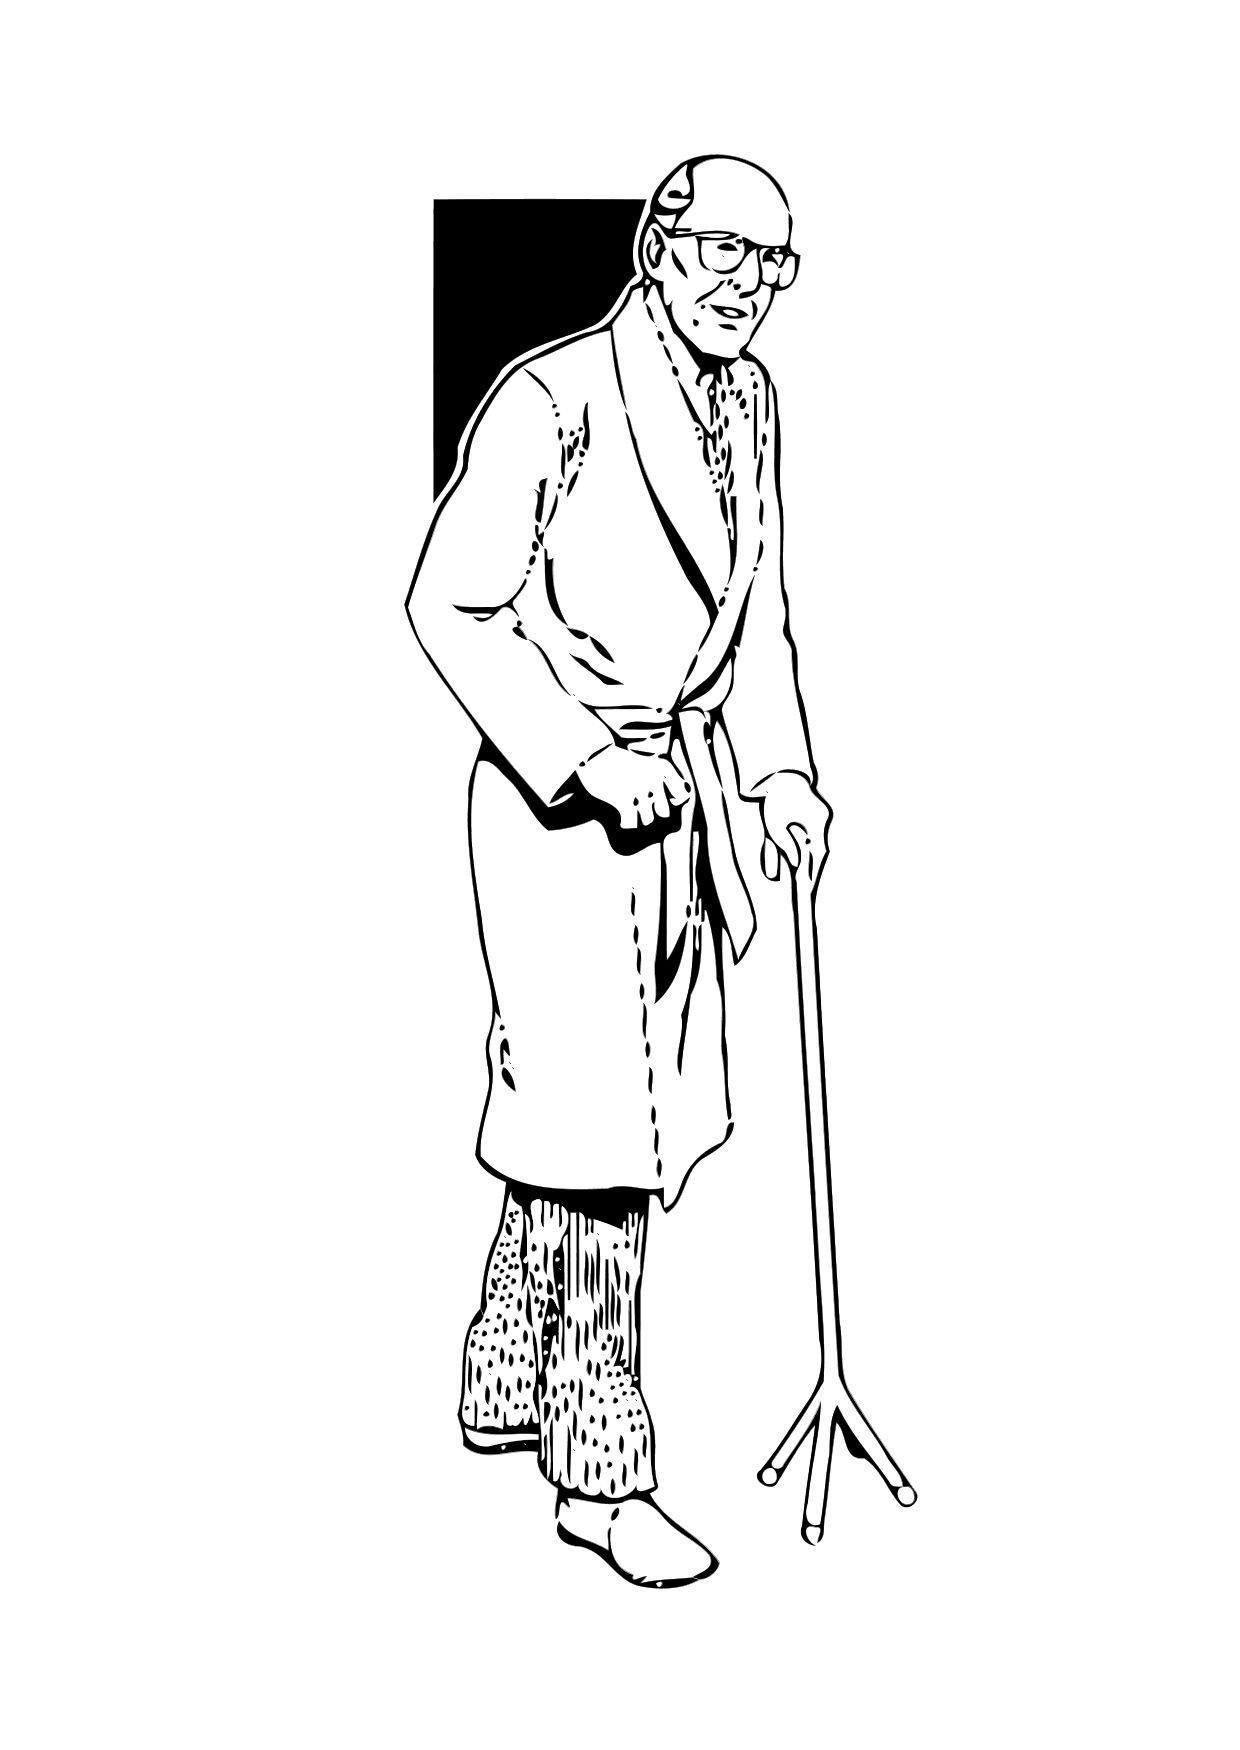 Dibujo Para Colorear Anciano Img 11347